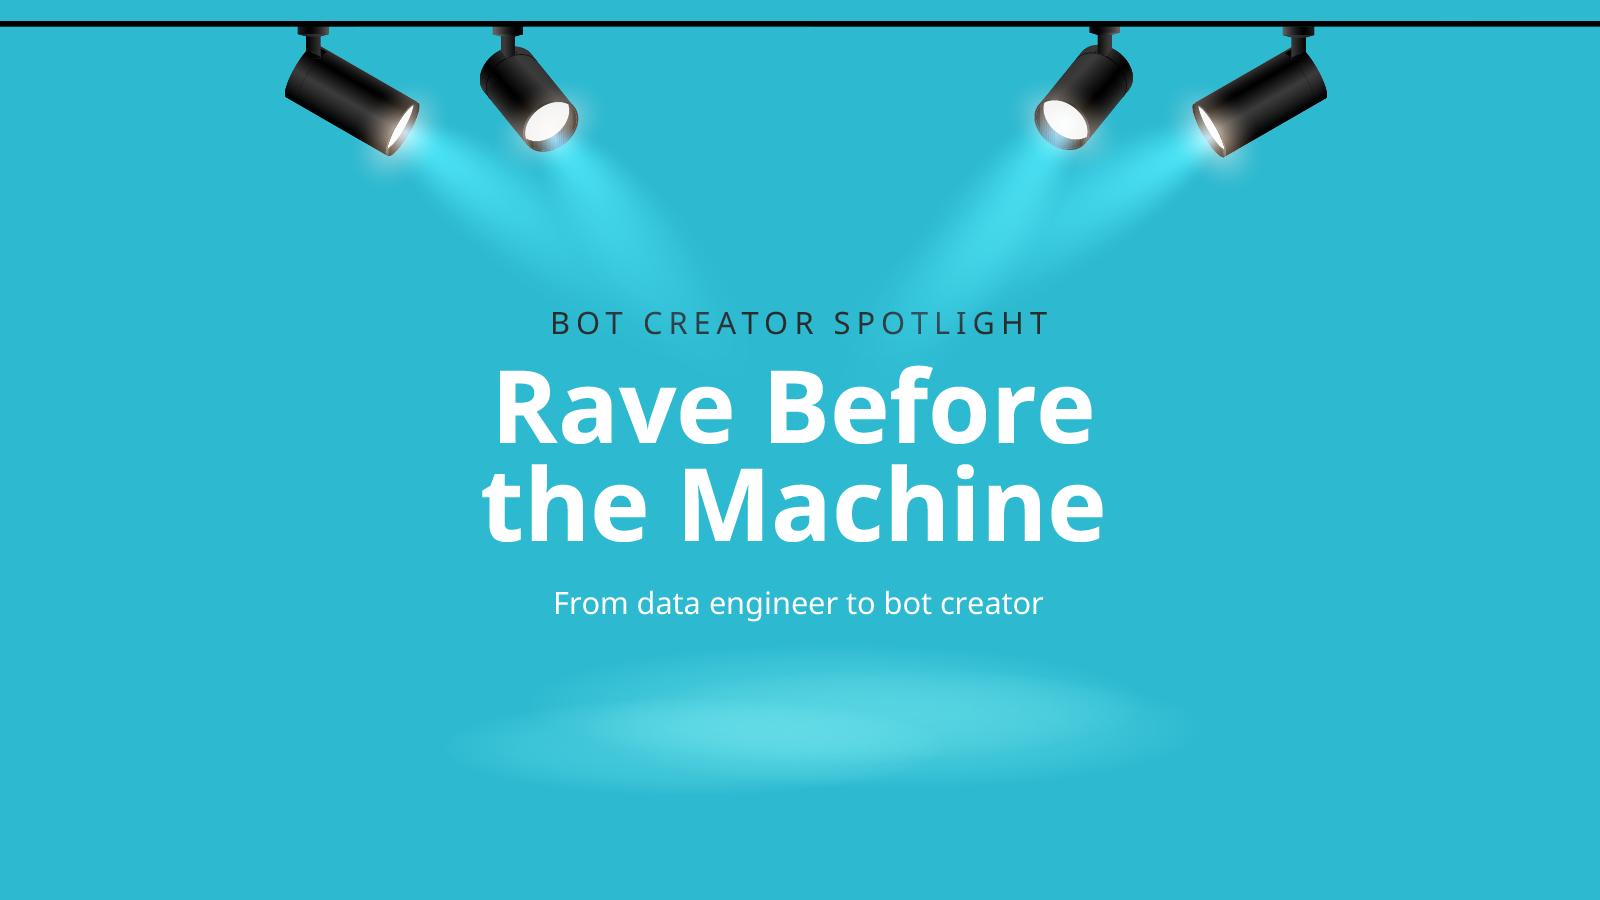 Bot creator spotlight: Rave Before theMachine